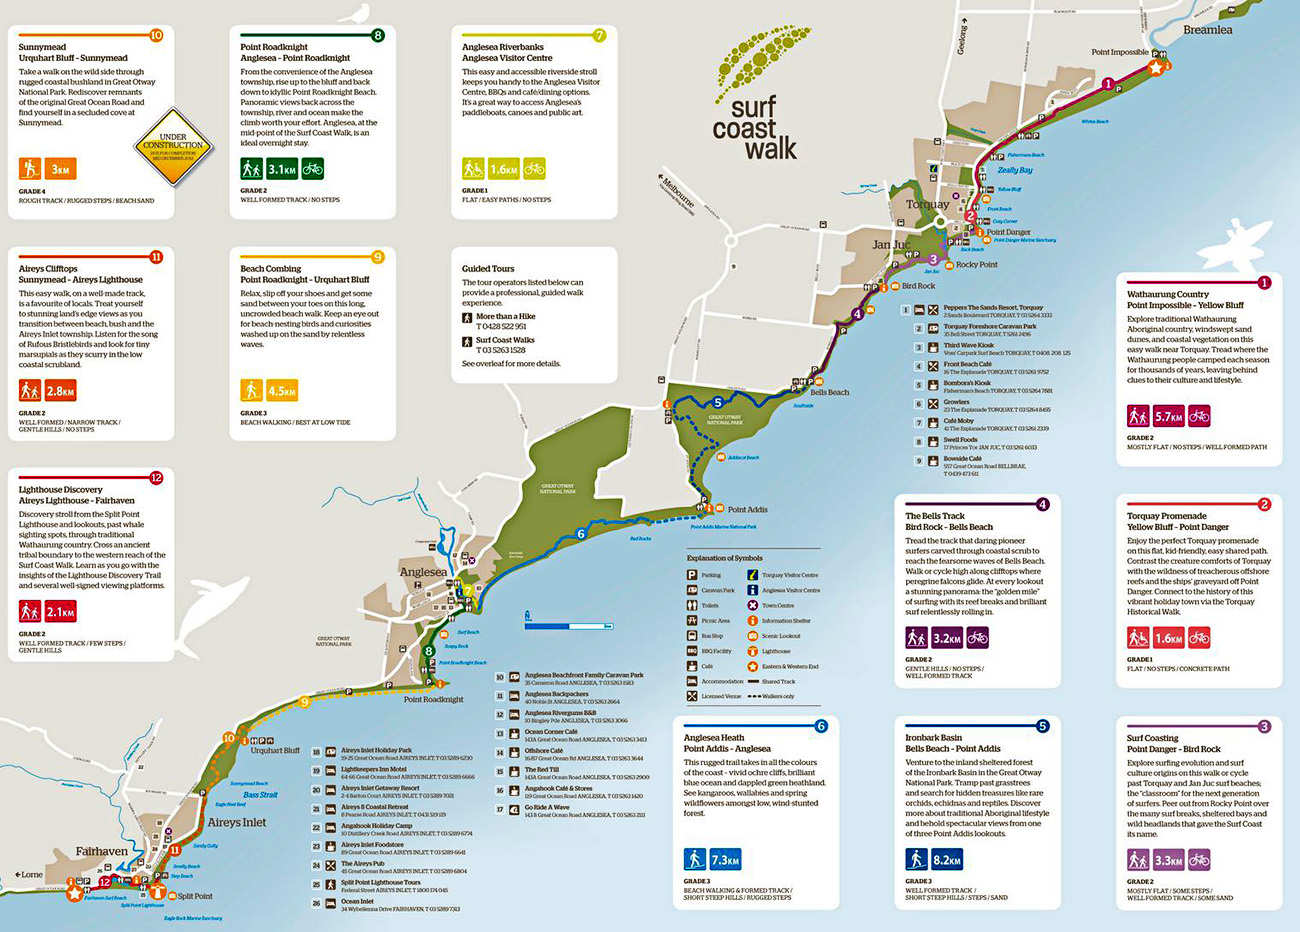 Surf Coast Walk Map